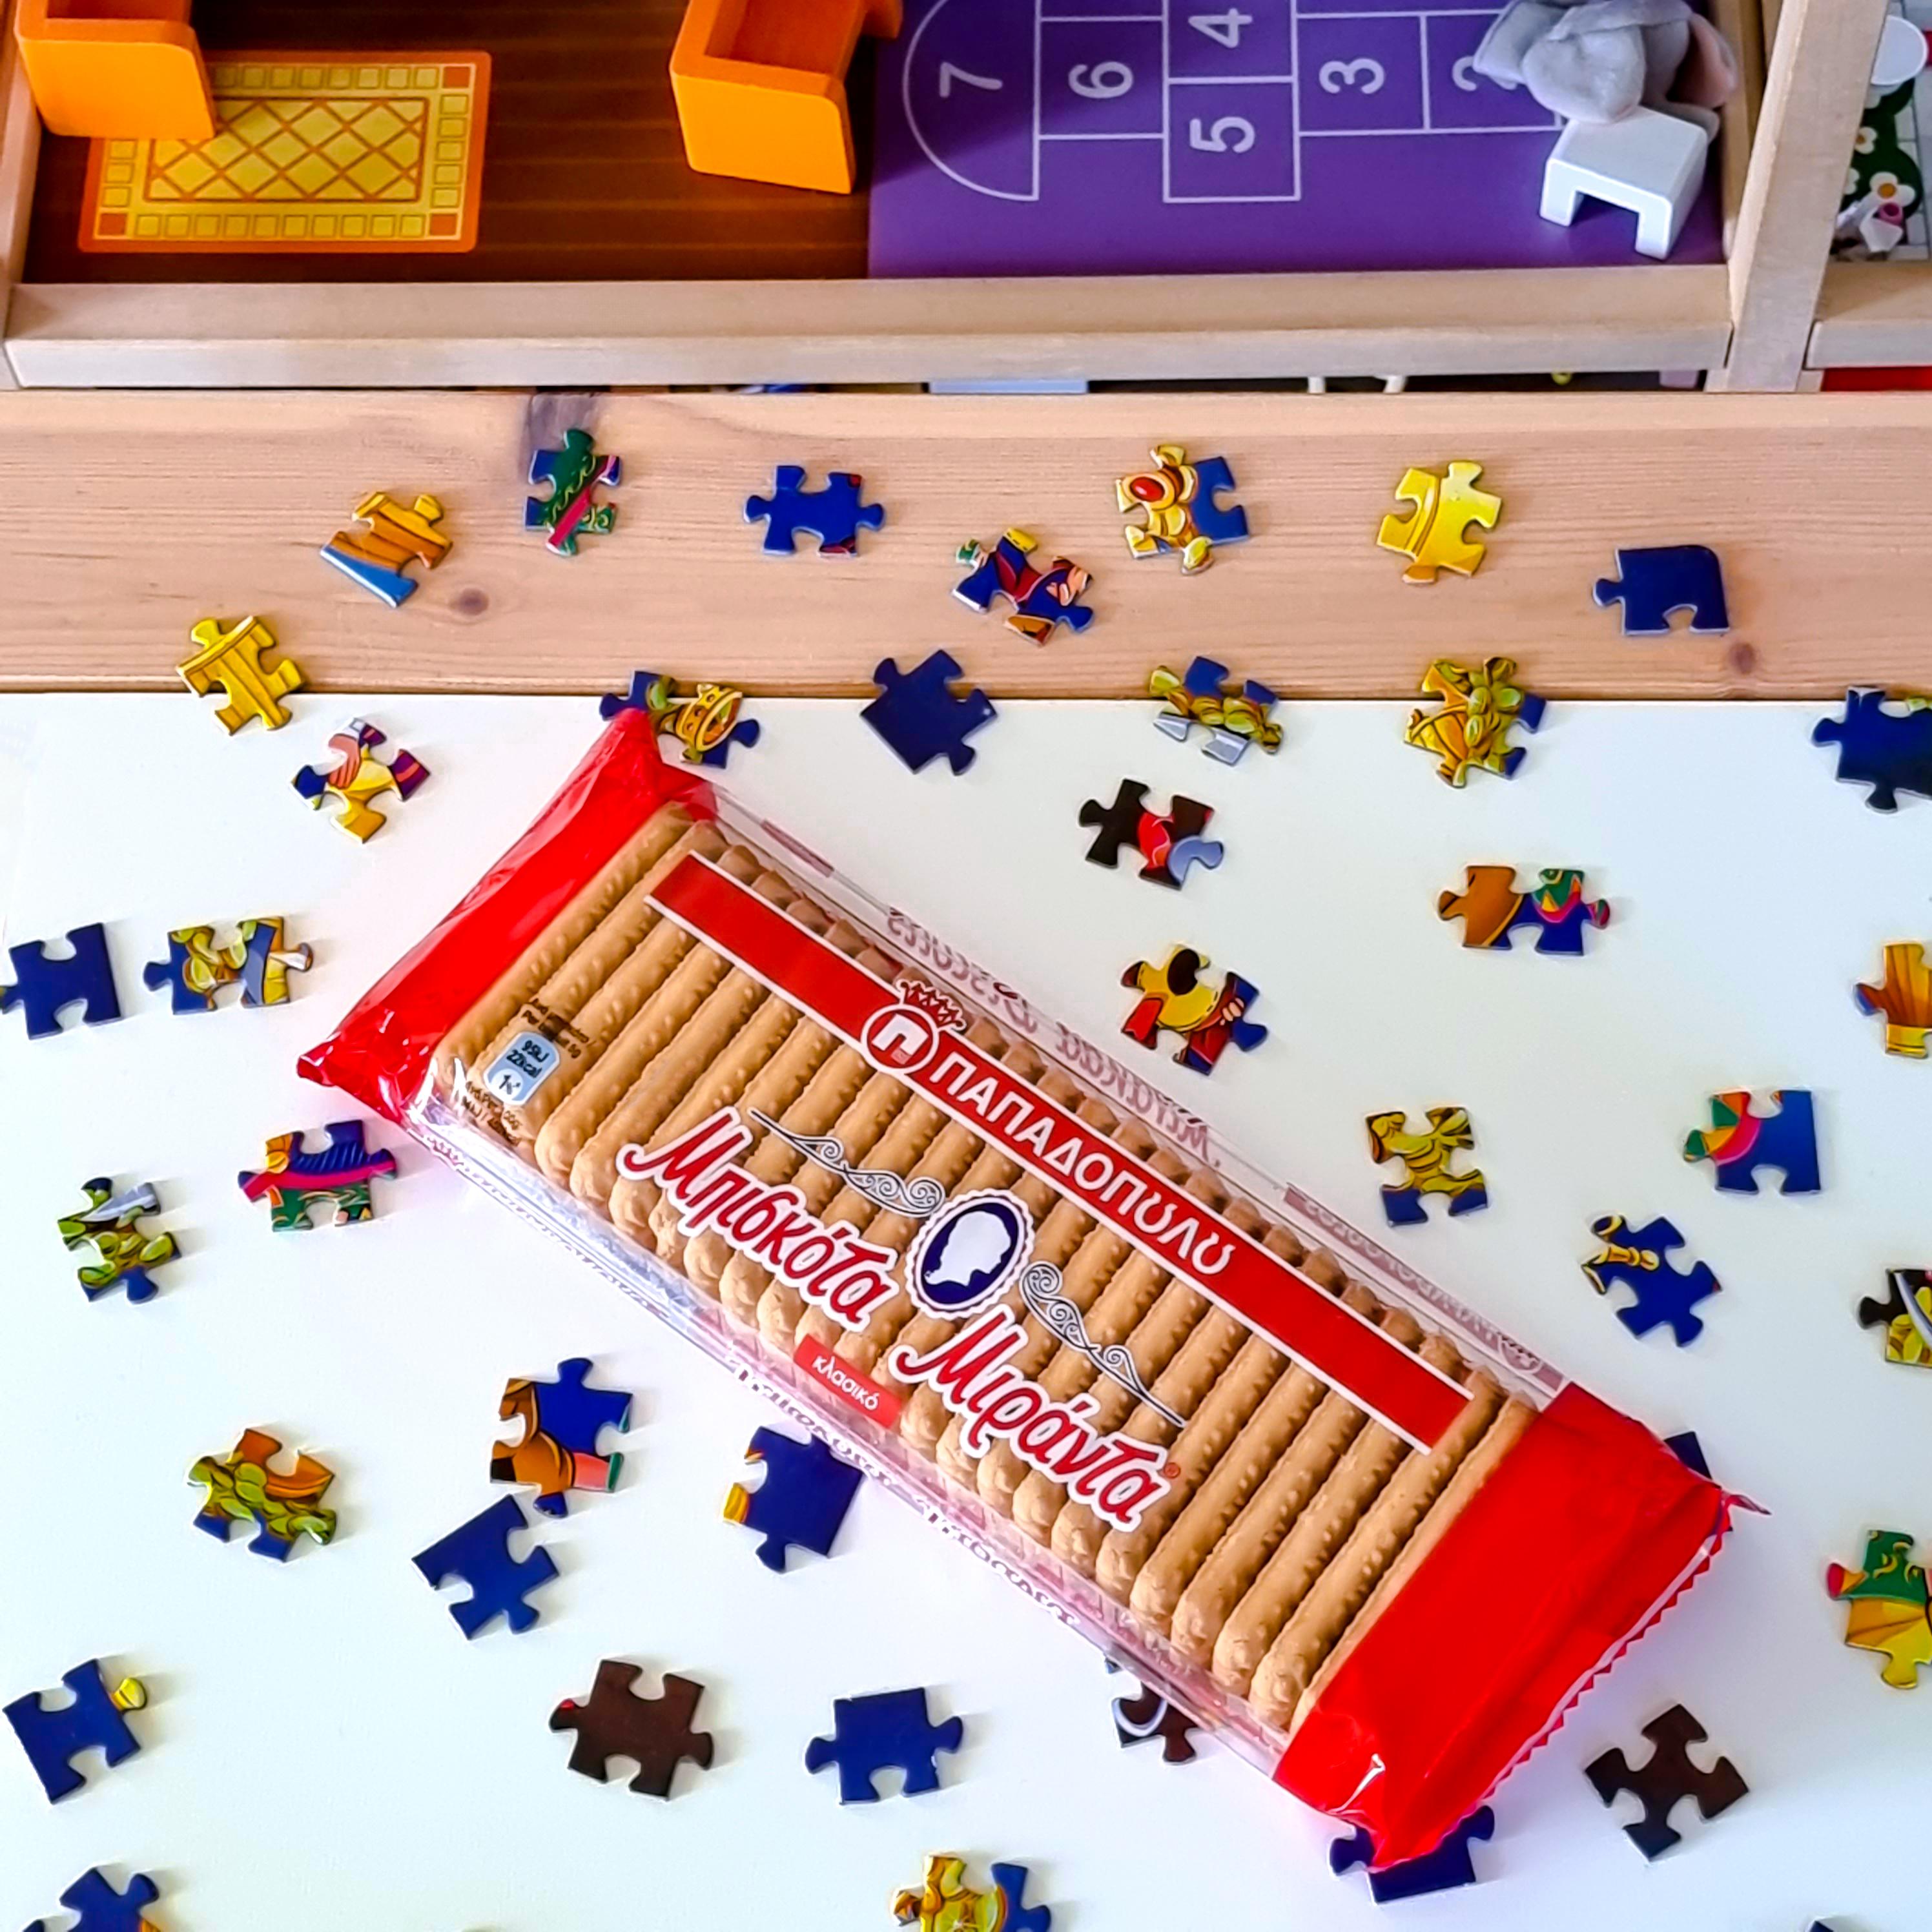 Image for Μιράντα, το γλυκό σνακ που θα δώσει ενέργεια για ατέλειωτο παιχνίδι!